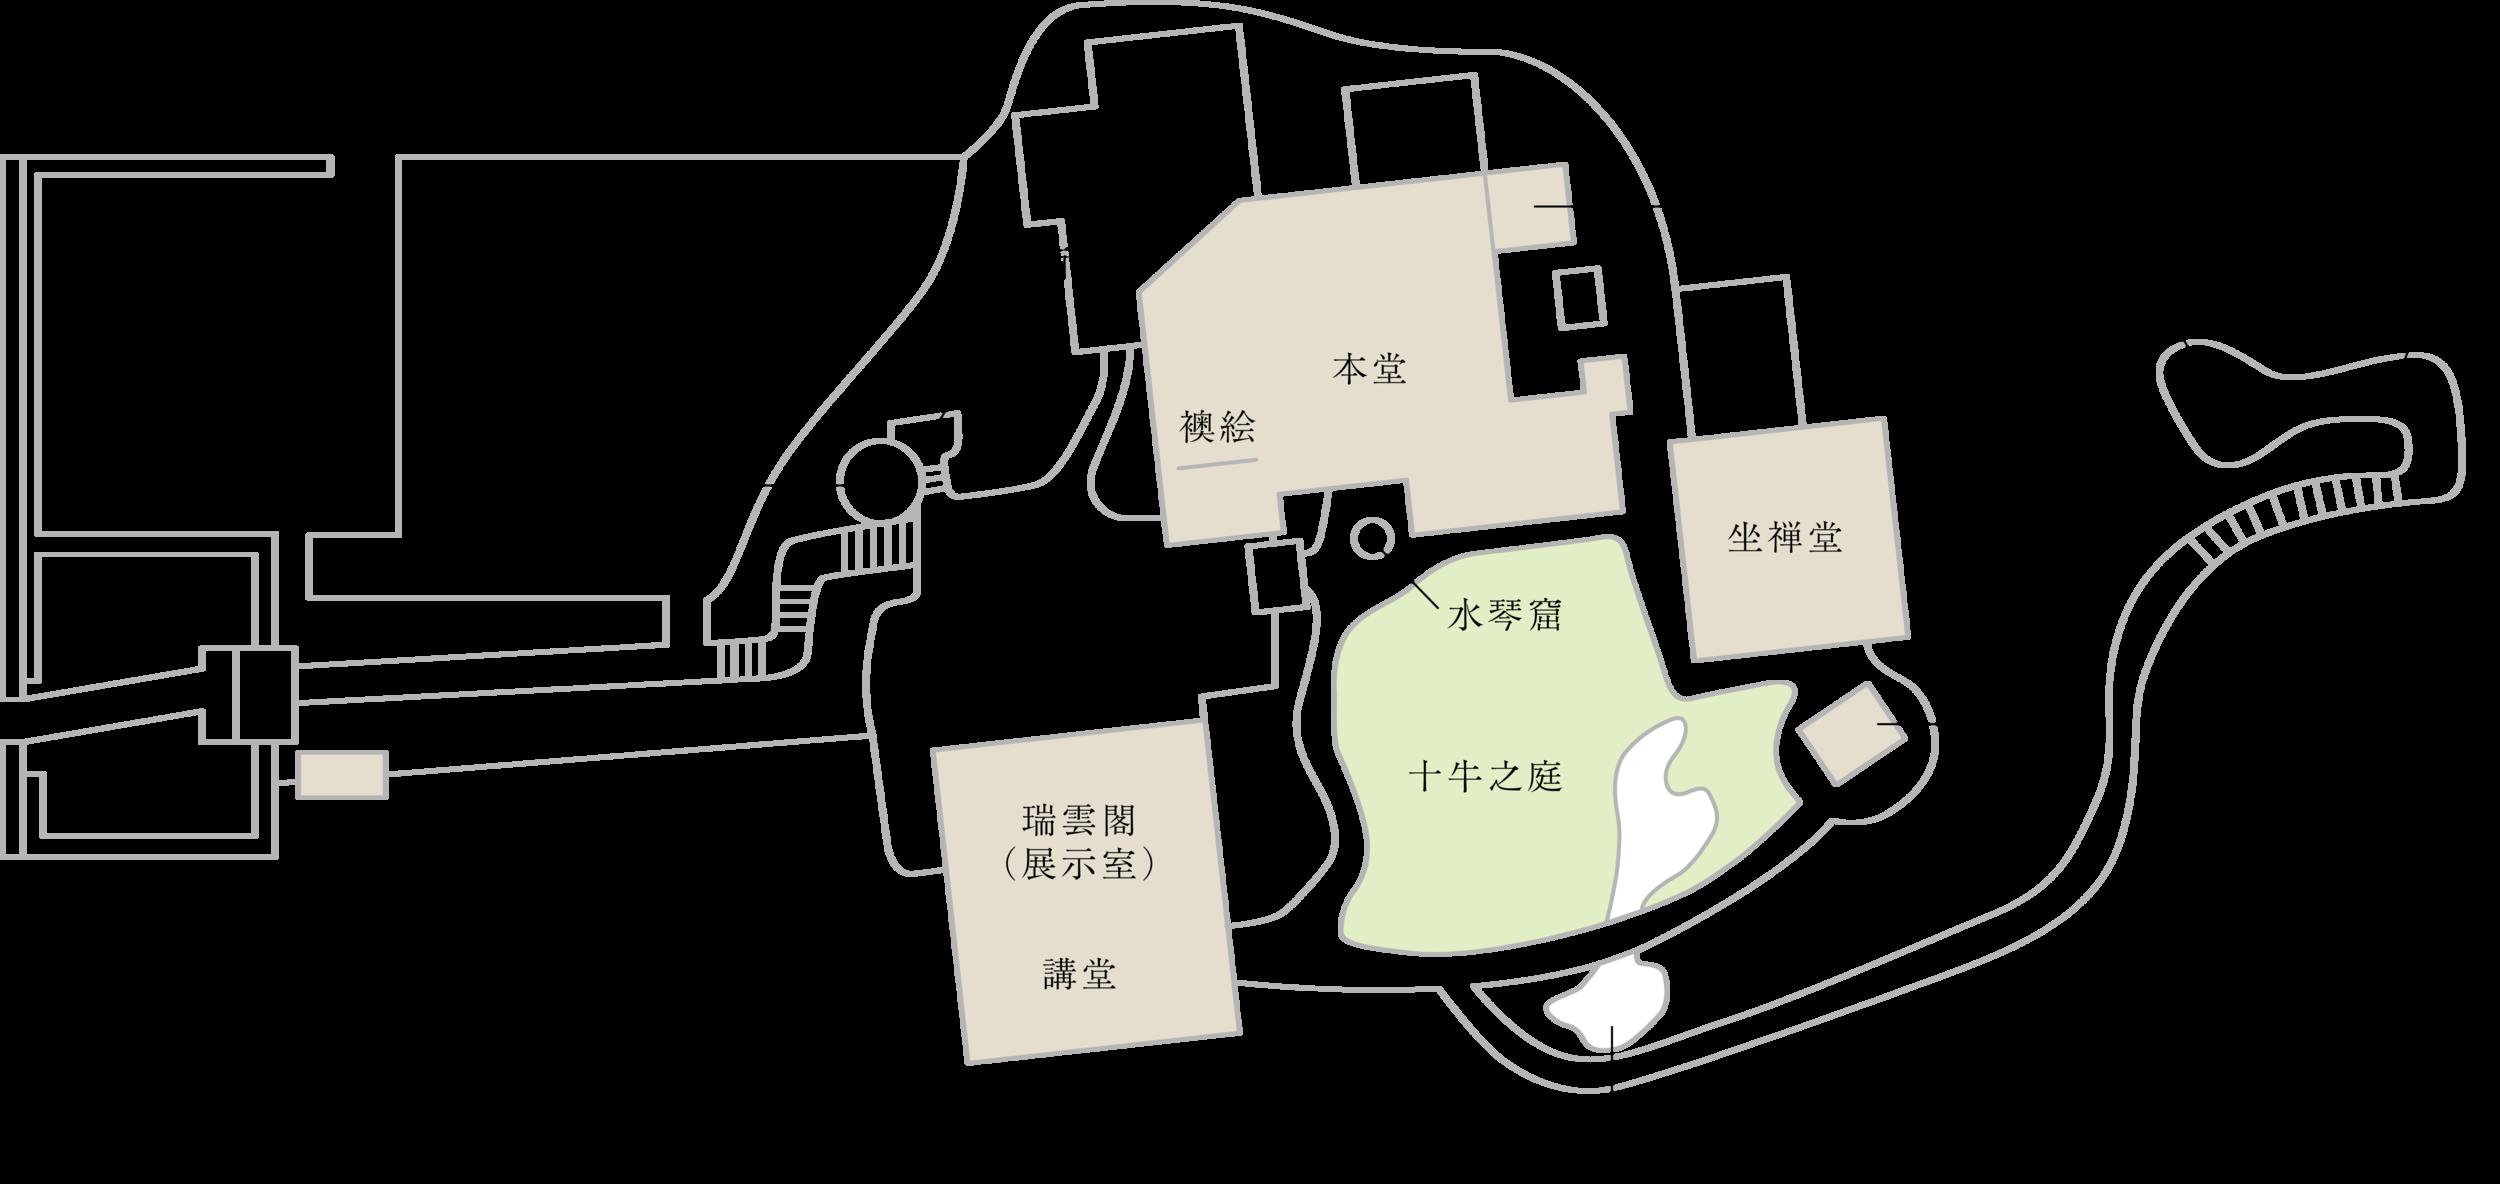 enkouji_map172.png